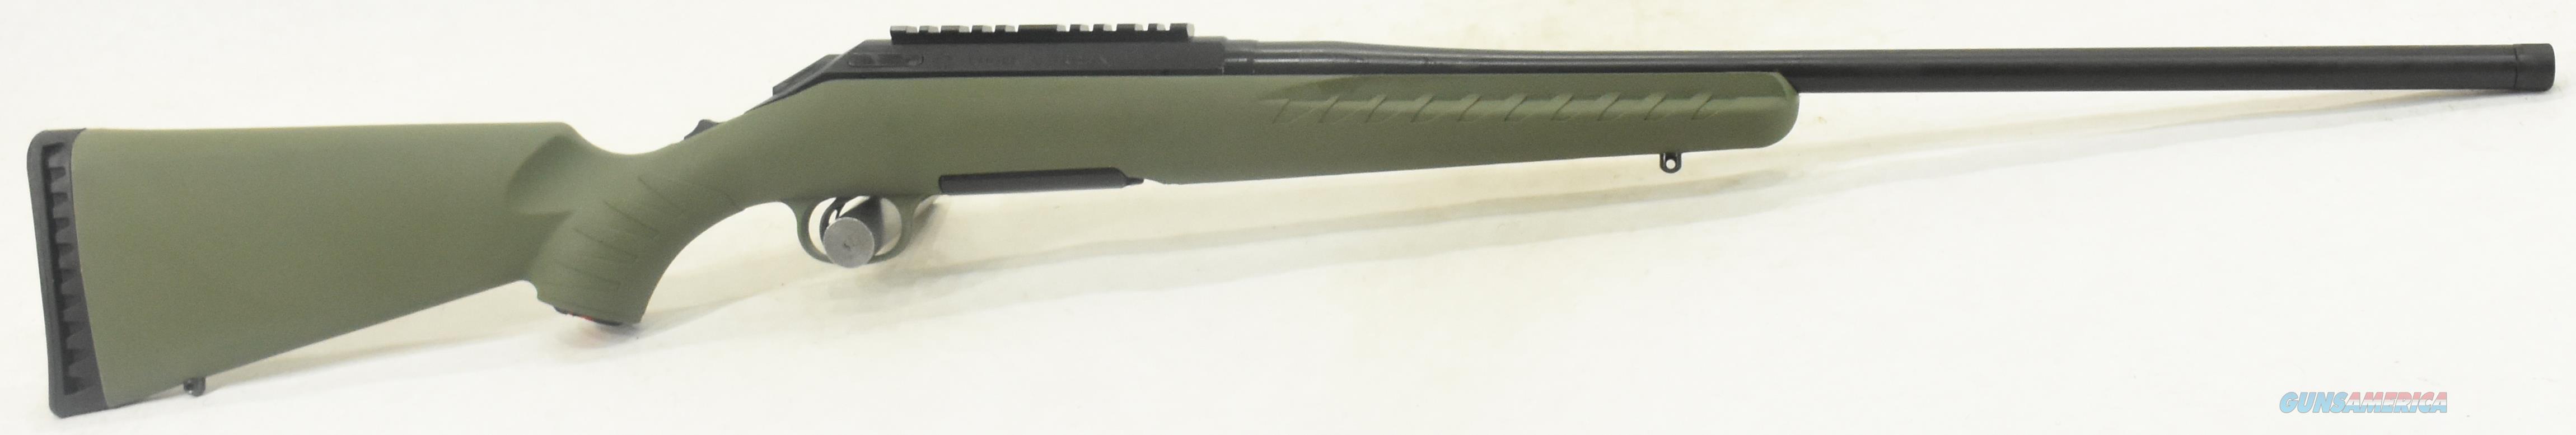 American Rifle Predator LH 308Win 22In  26918  Guns > Rifles > Ruger Rifles > American Rifle